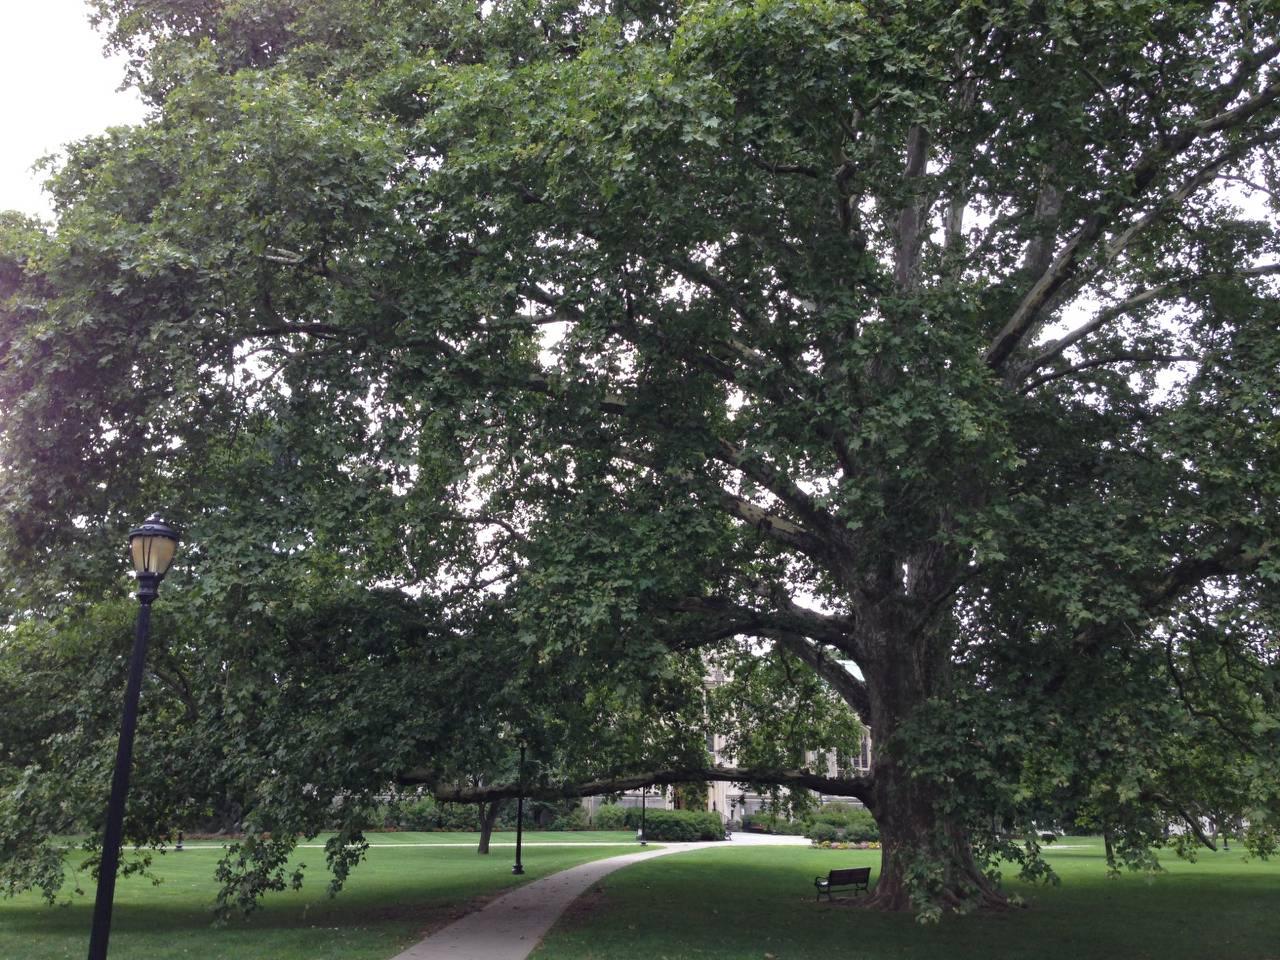 Beech tree with longest limb!